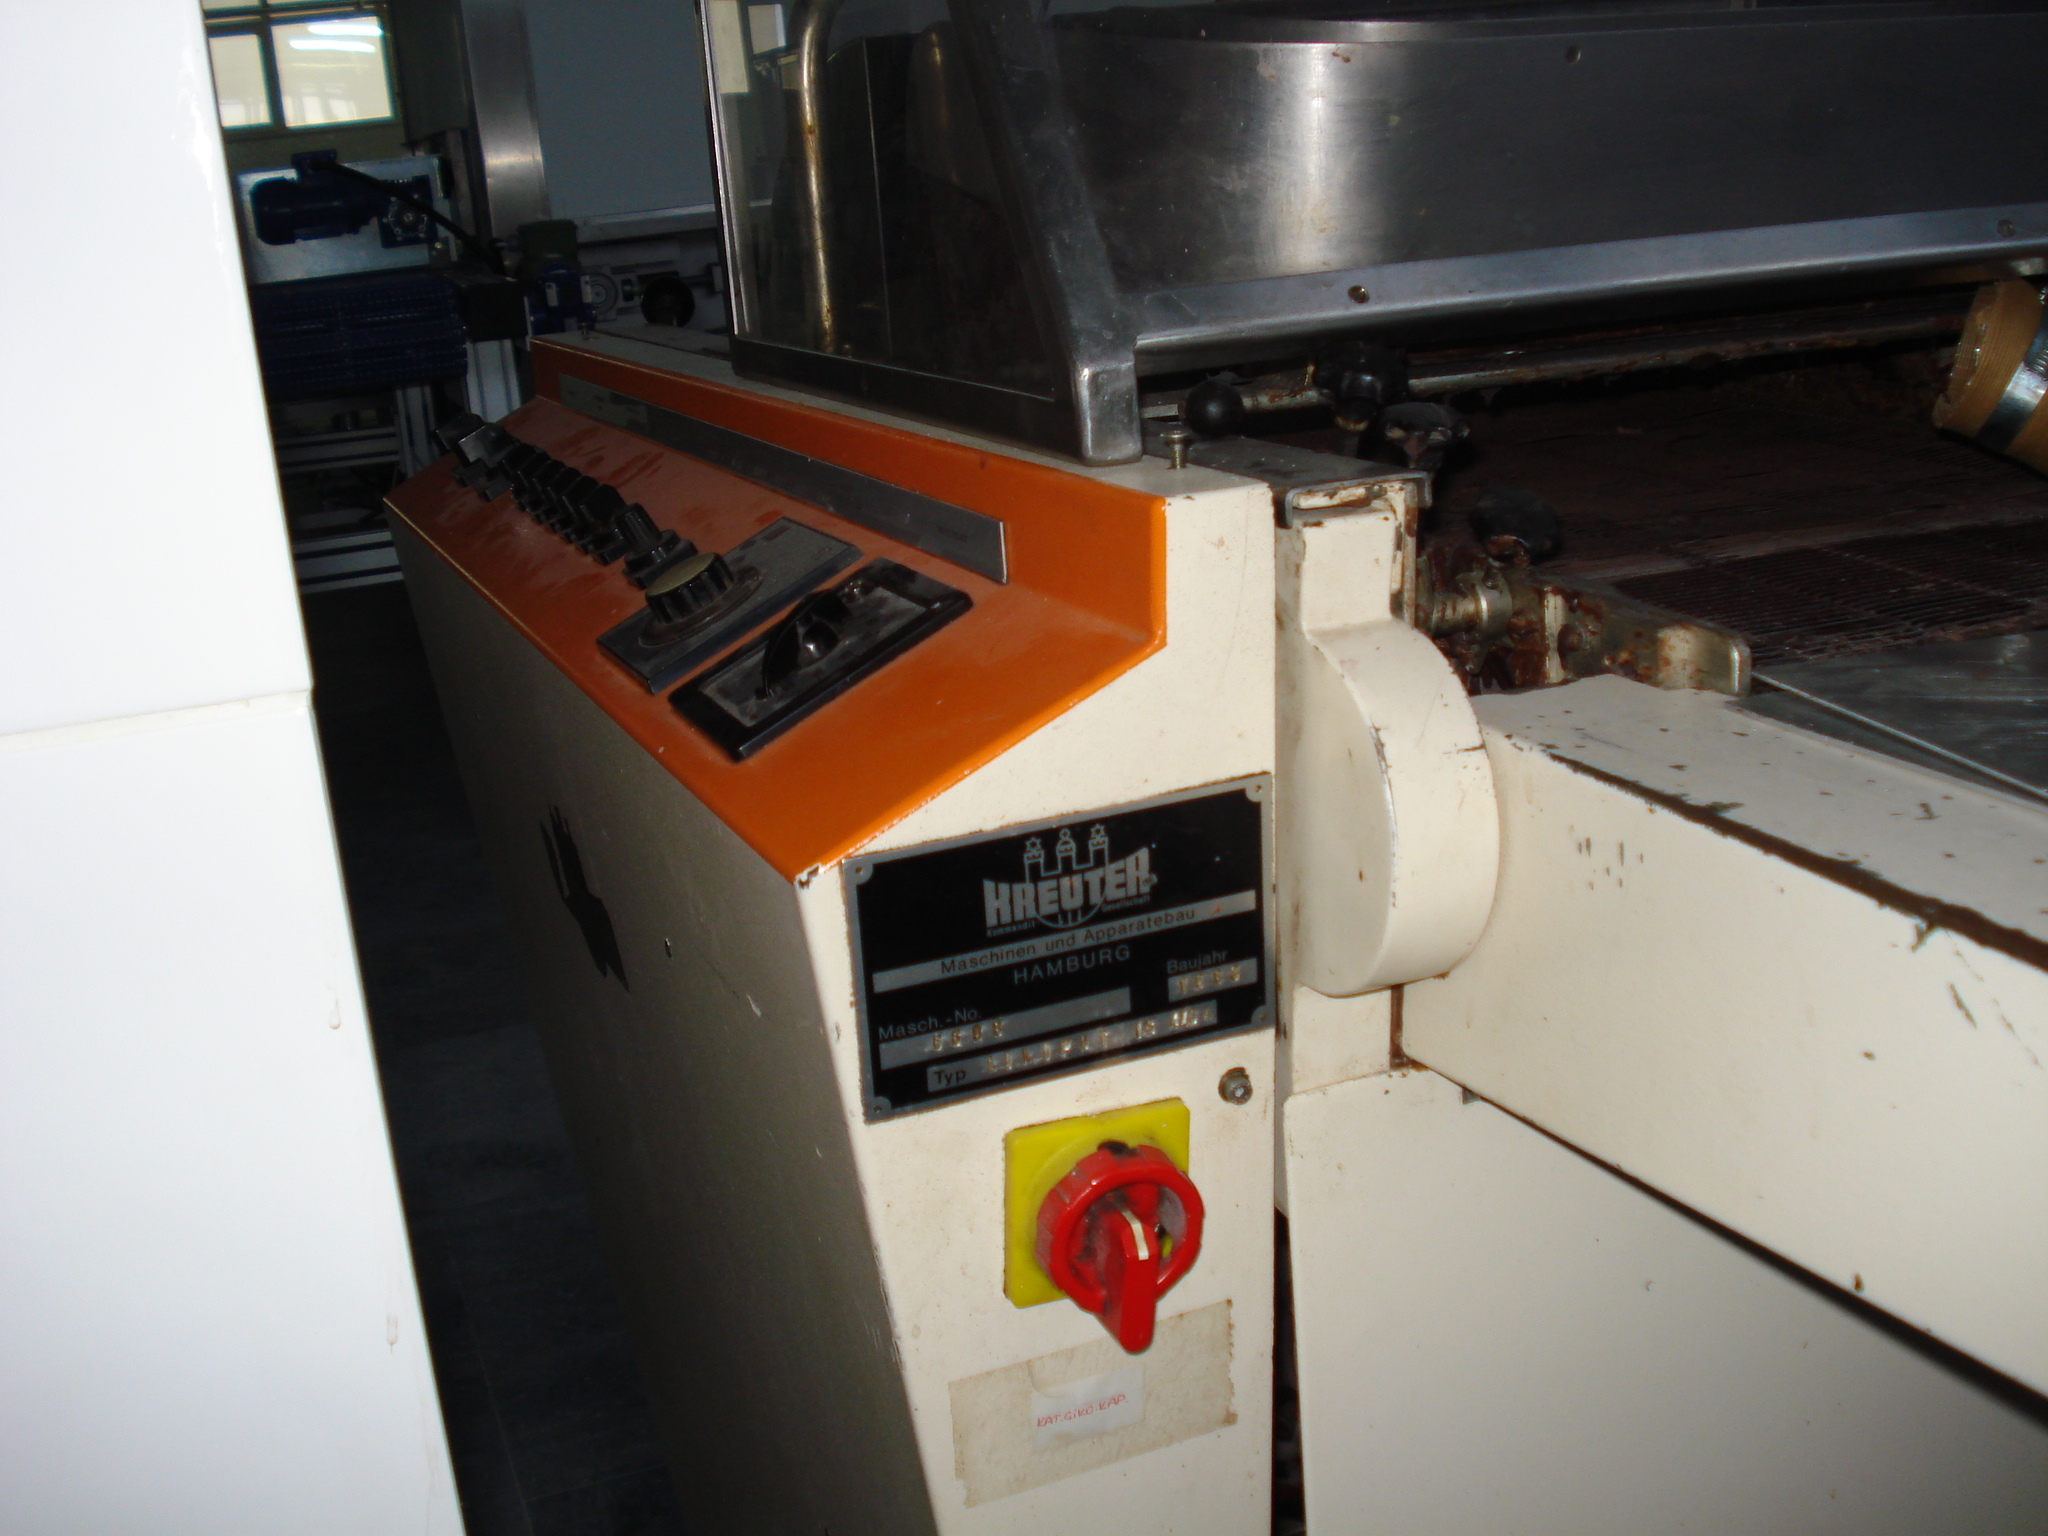 machine de production de chocolat krueter machines d 39 occasion exapro. Black Bedroom Furniture Sets. Home Design Ideas